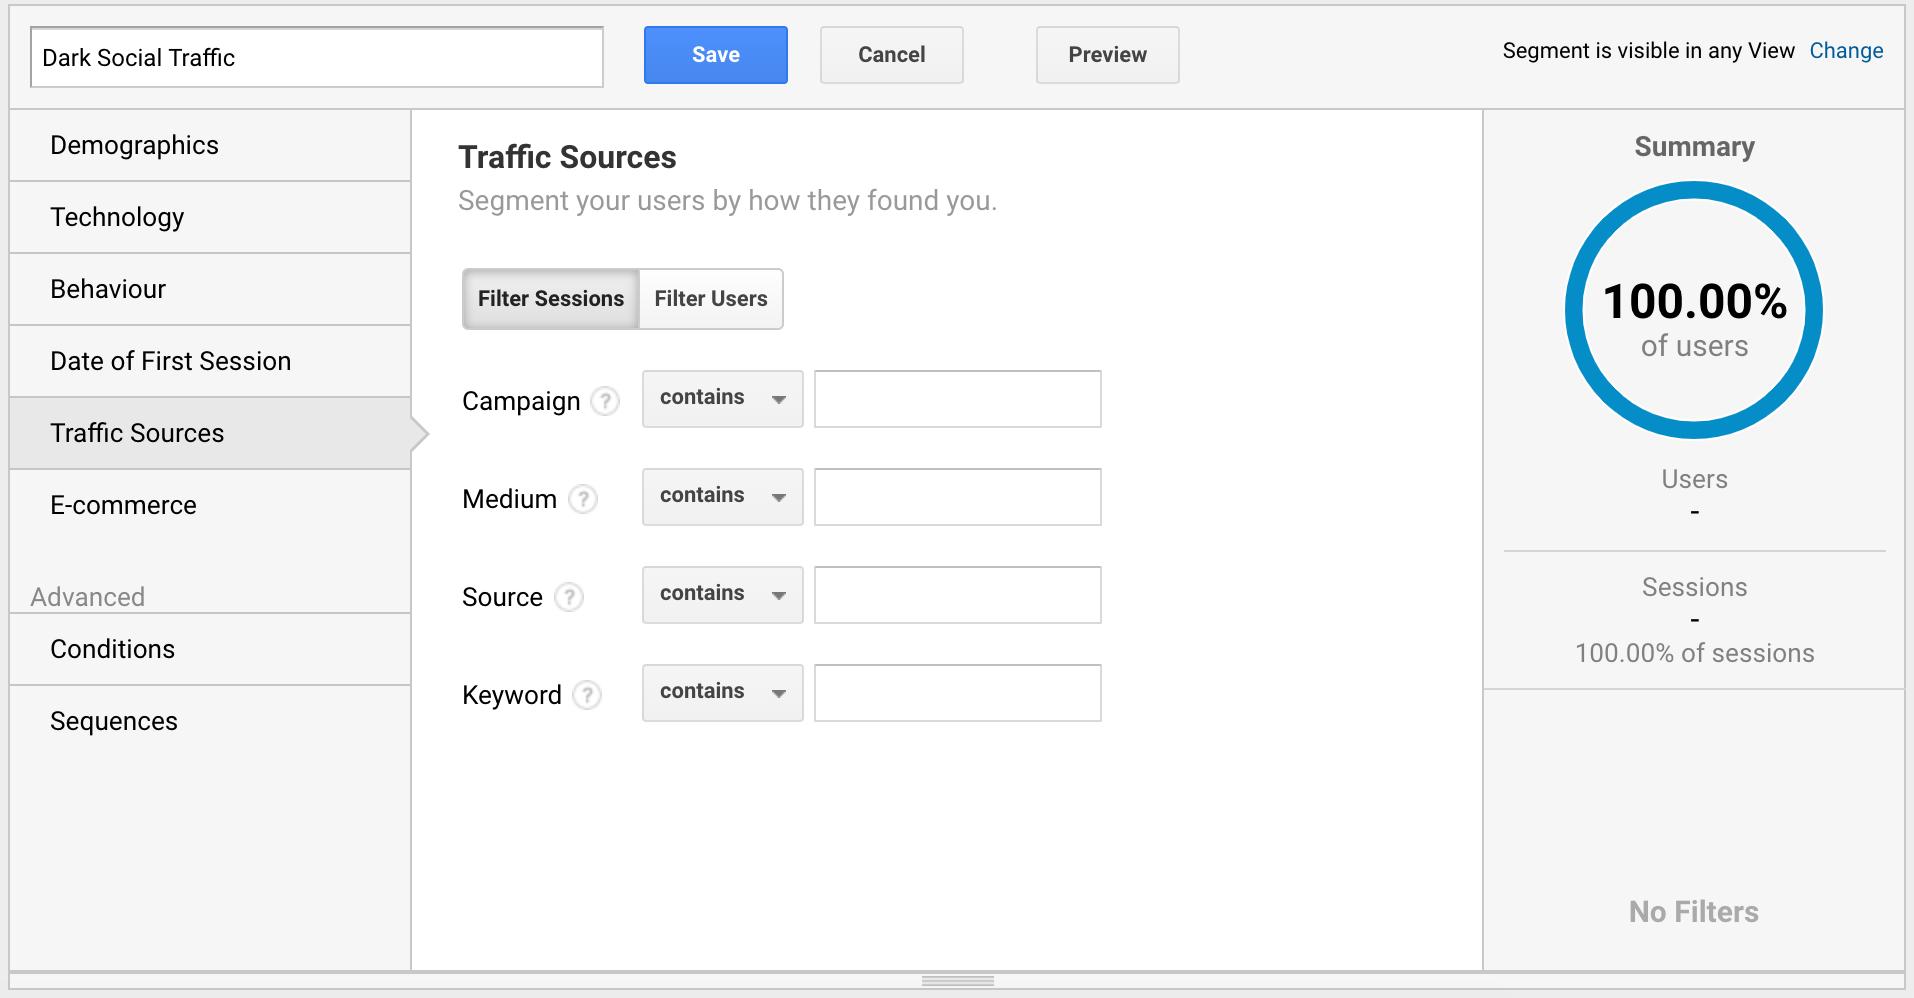 New segment traffic sources